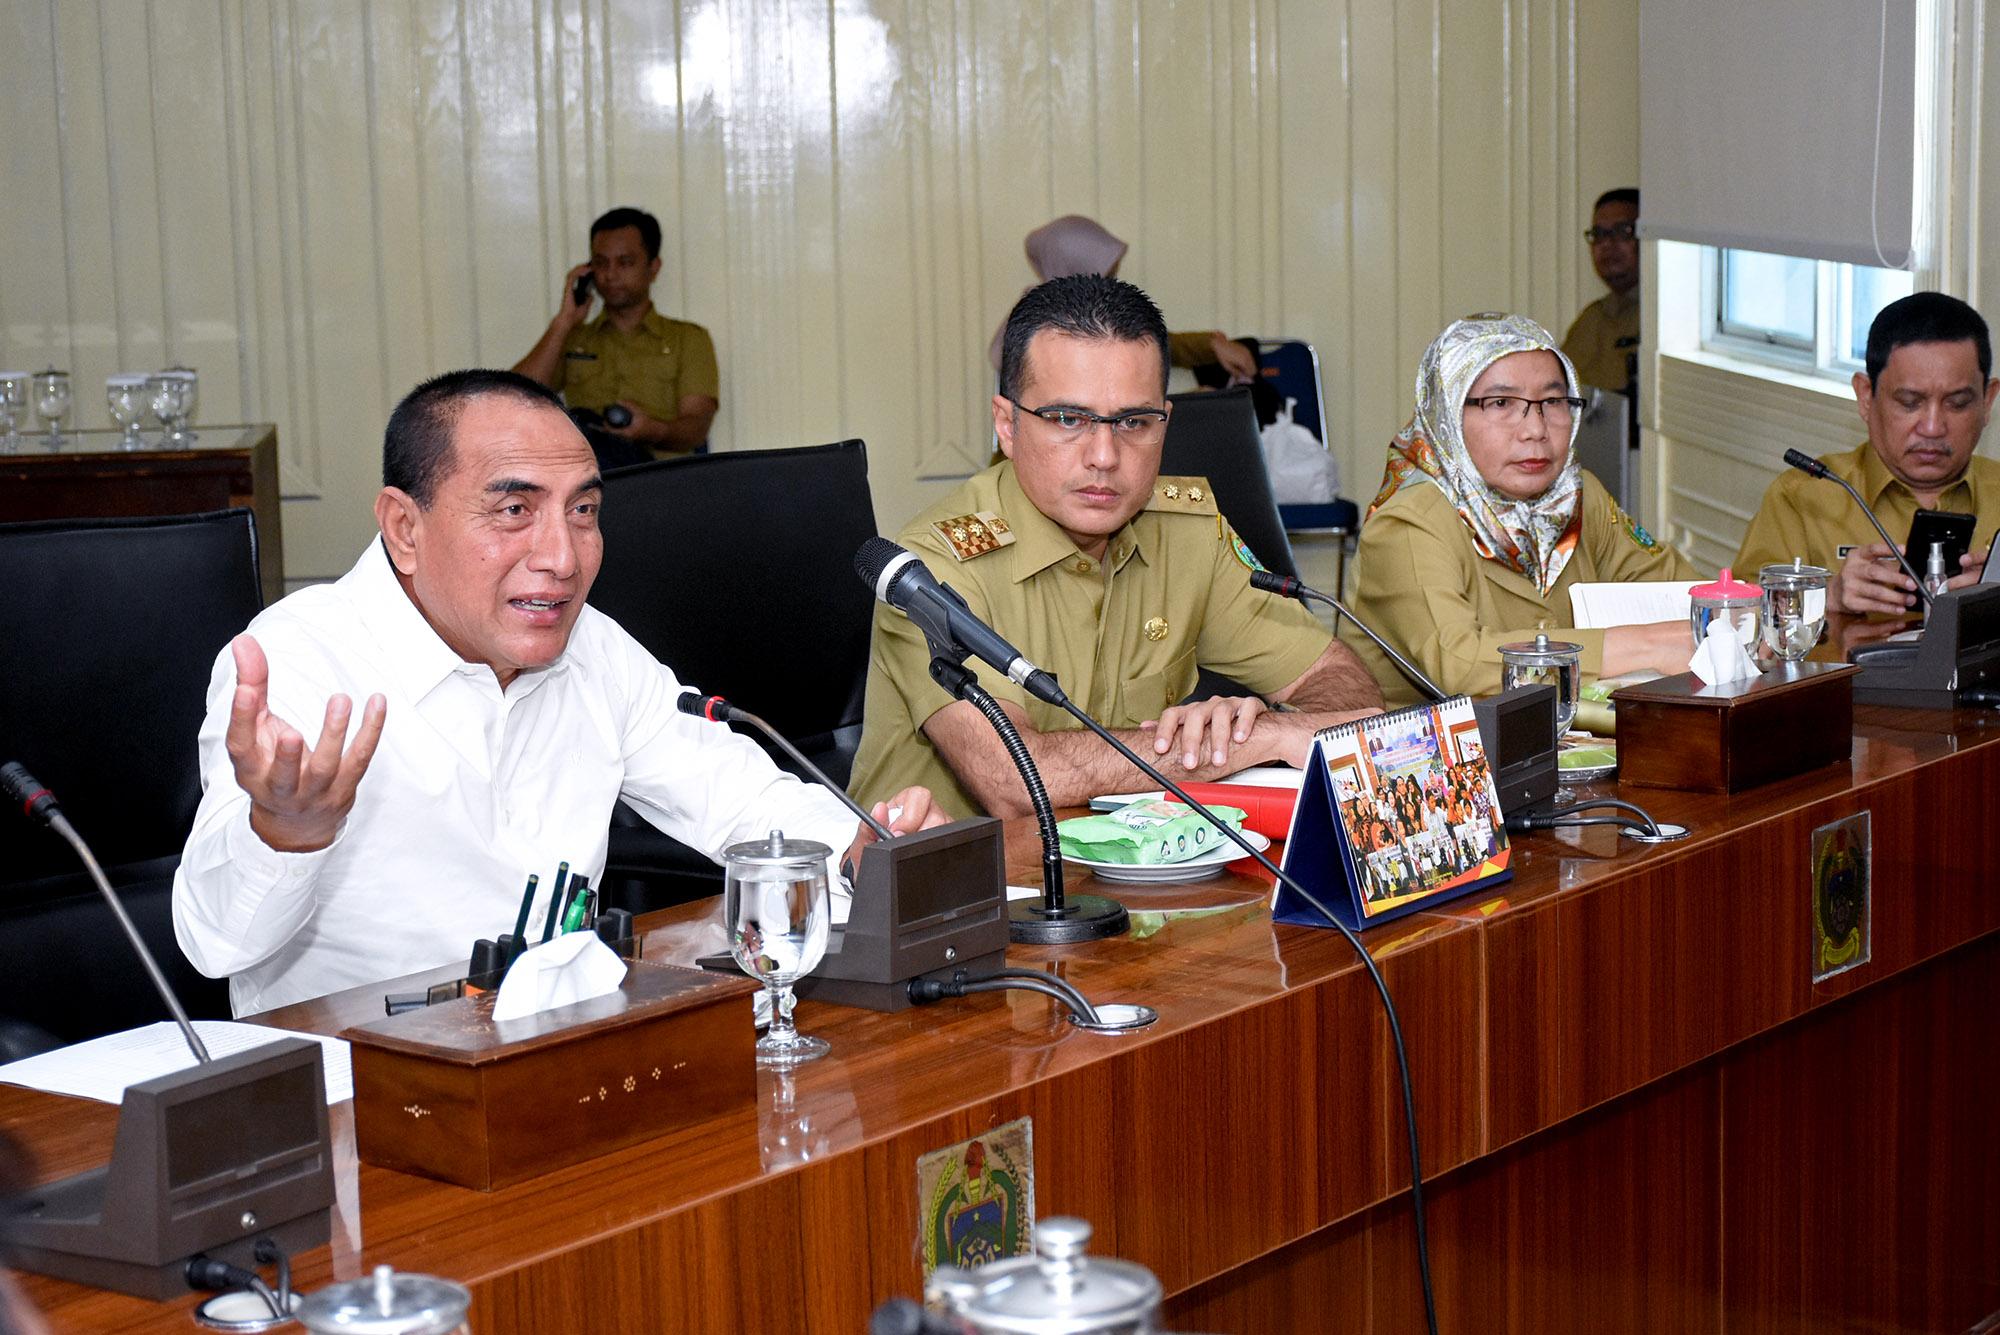 Gubernur Sumut Edy Rahmayadi memimpin rapat penanggulangan wabah Covid-19. Foto: Biro Humas dan Keprotokolan Setdaprovsu/ Imam Syahputra